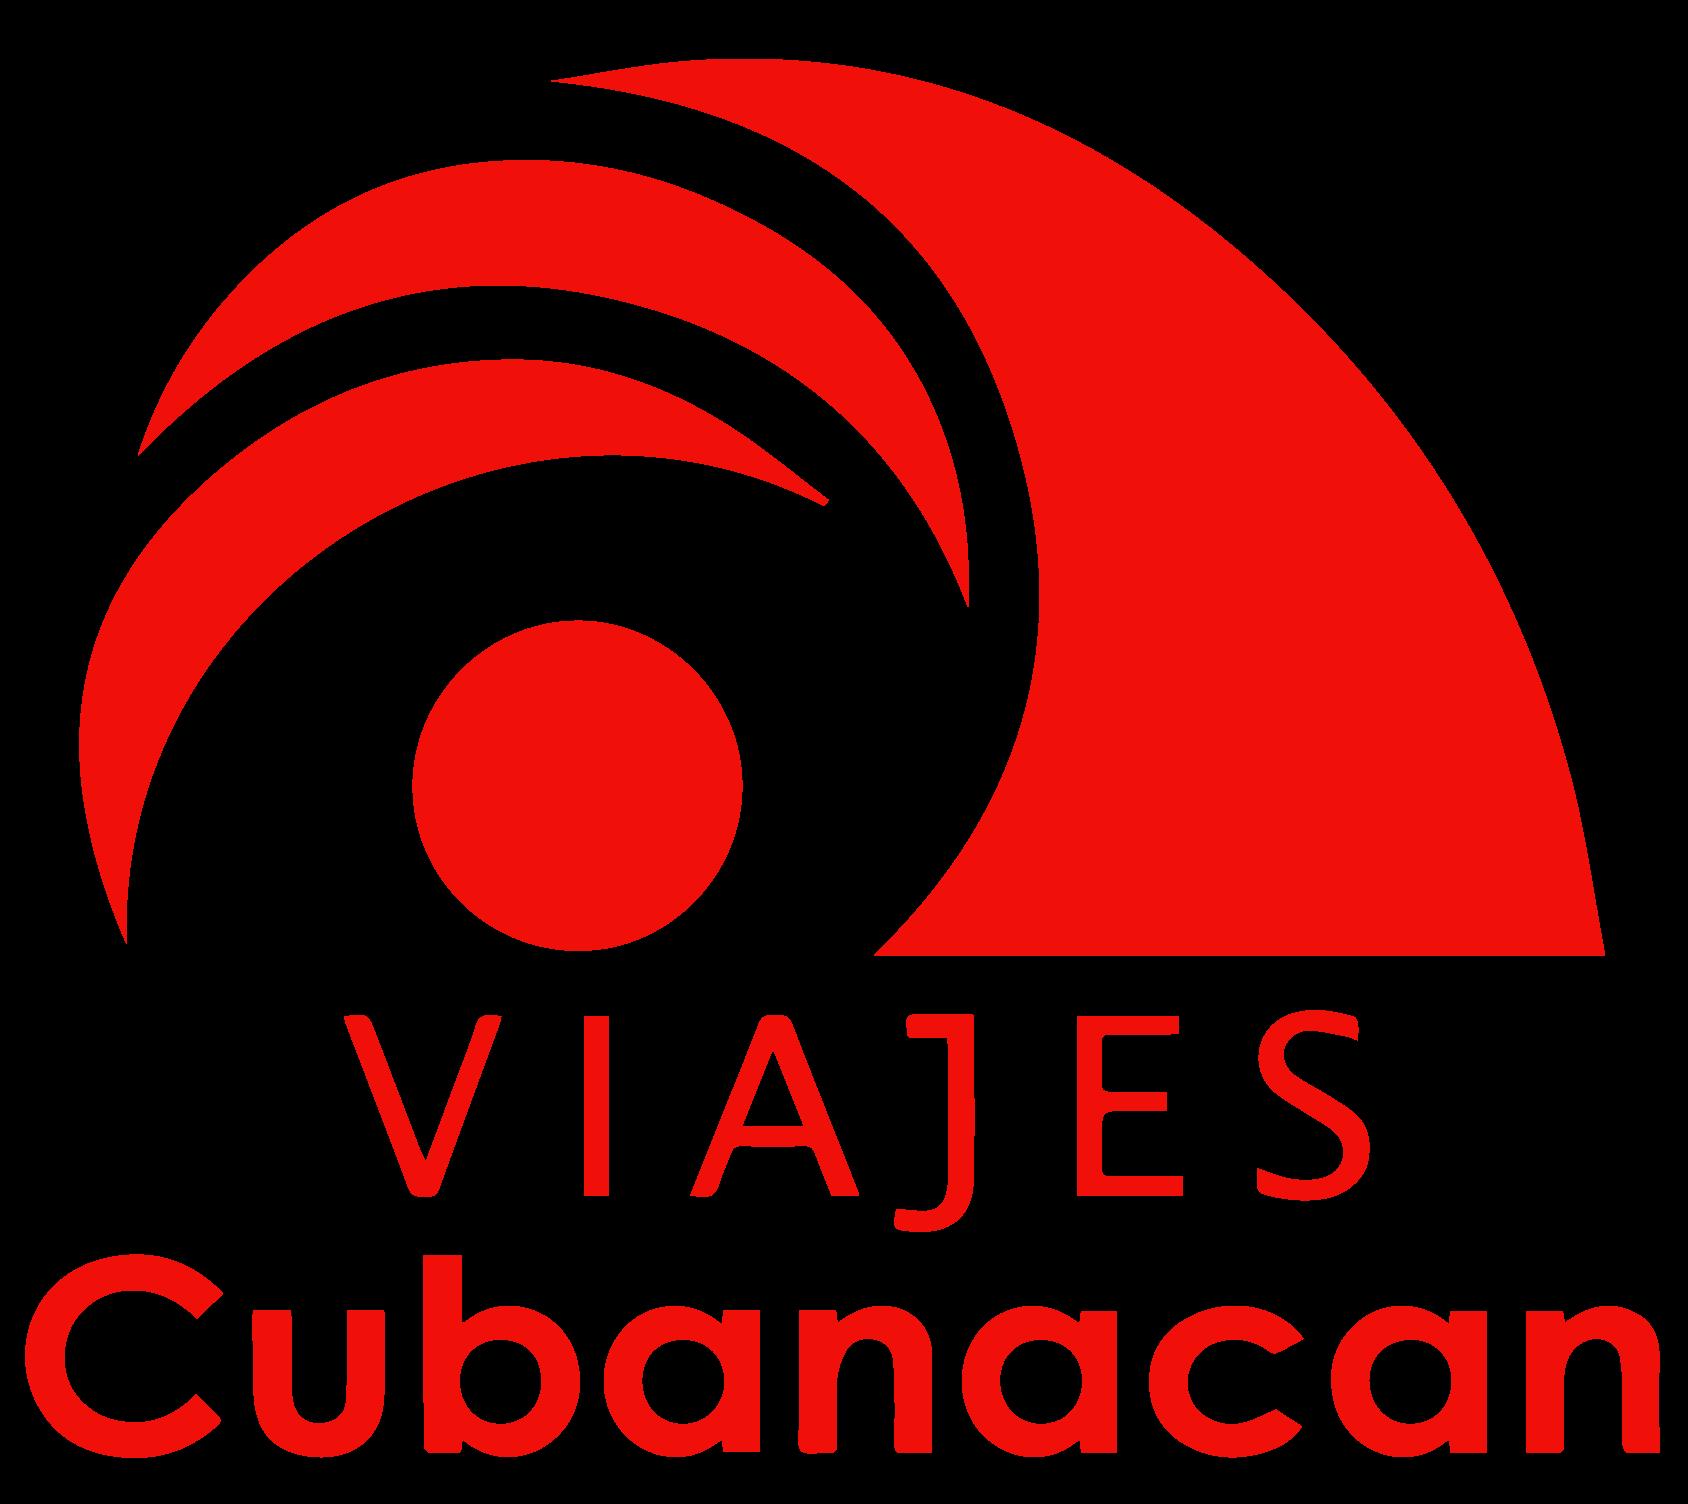 Cubanacan